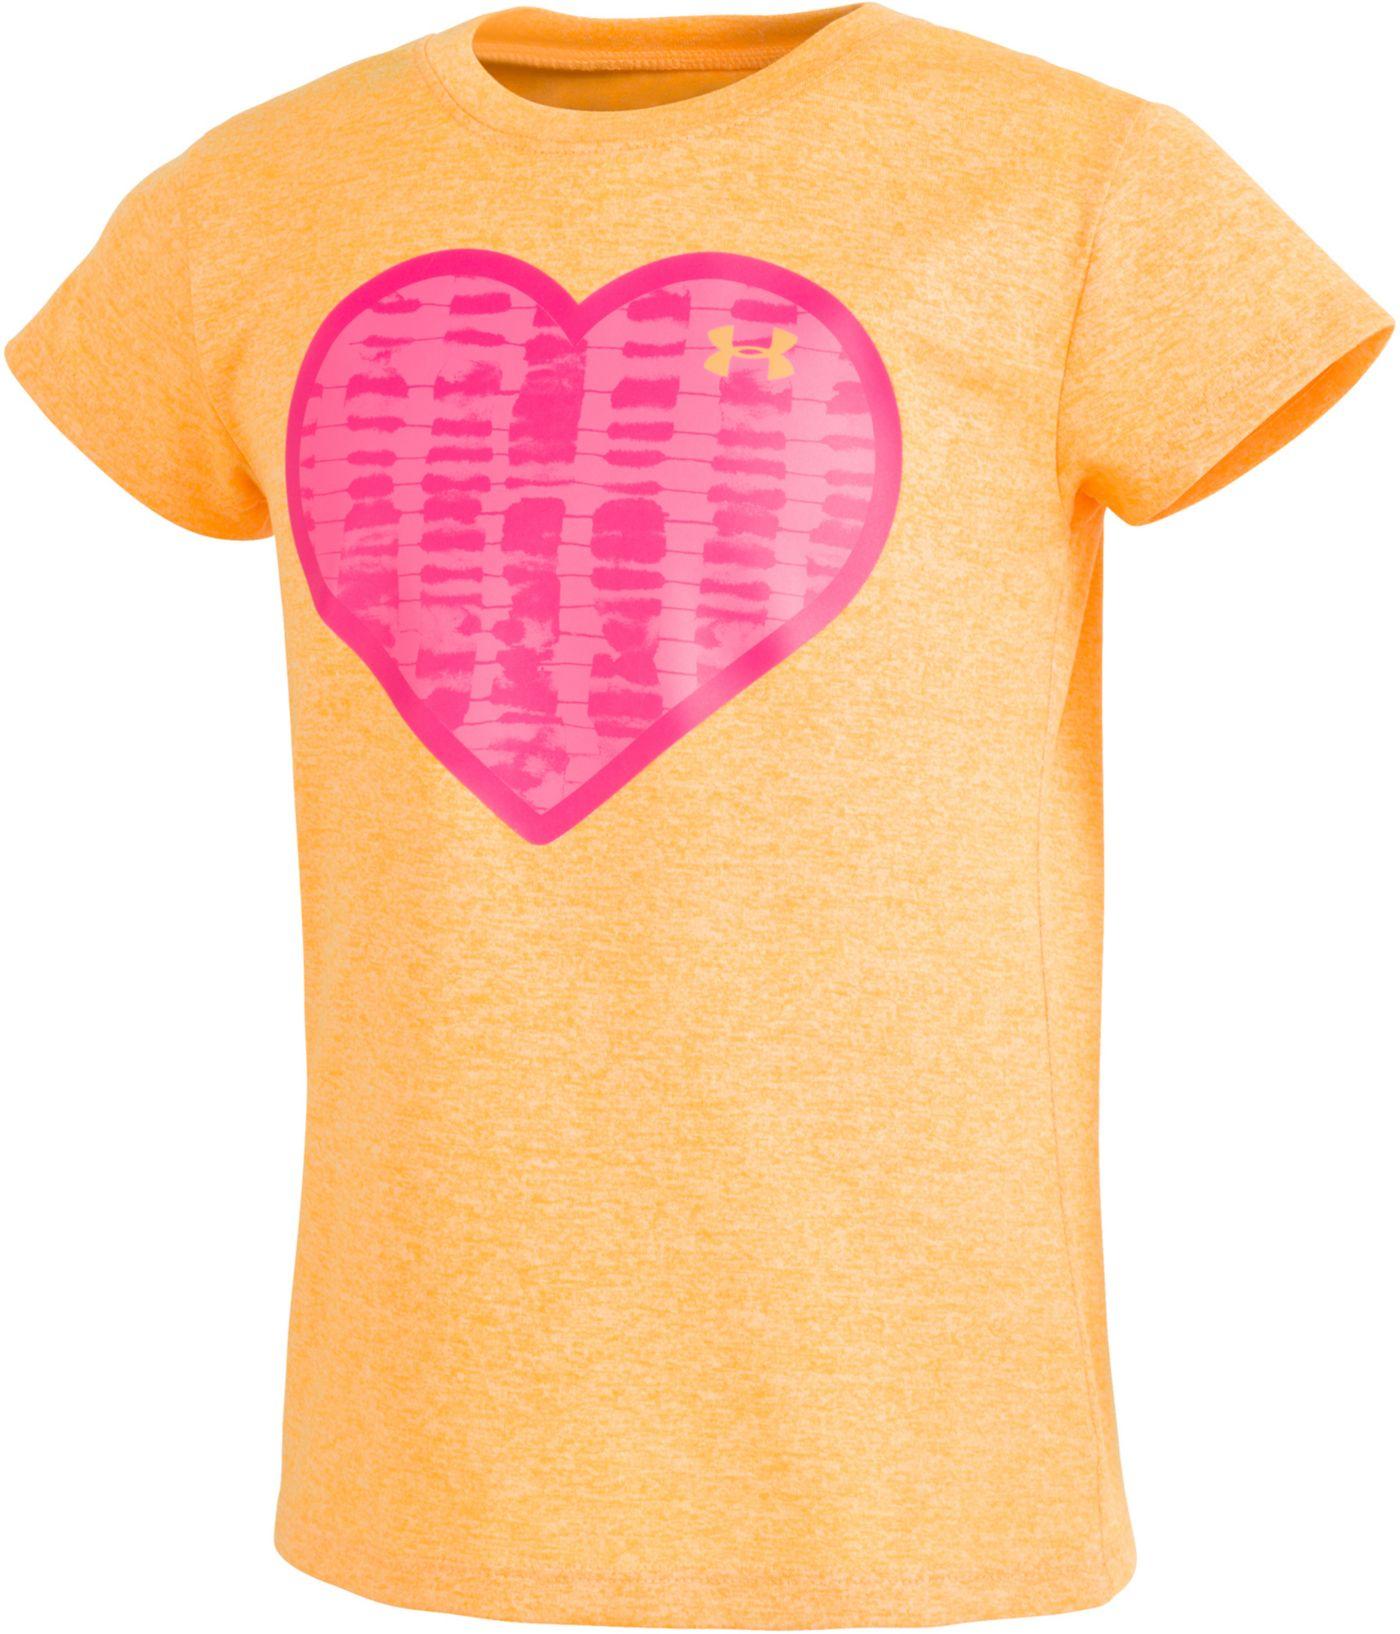 Under Armour Little Girls' Hazy Heart Graphic T-Shirt